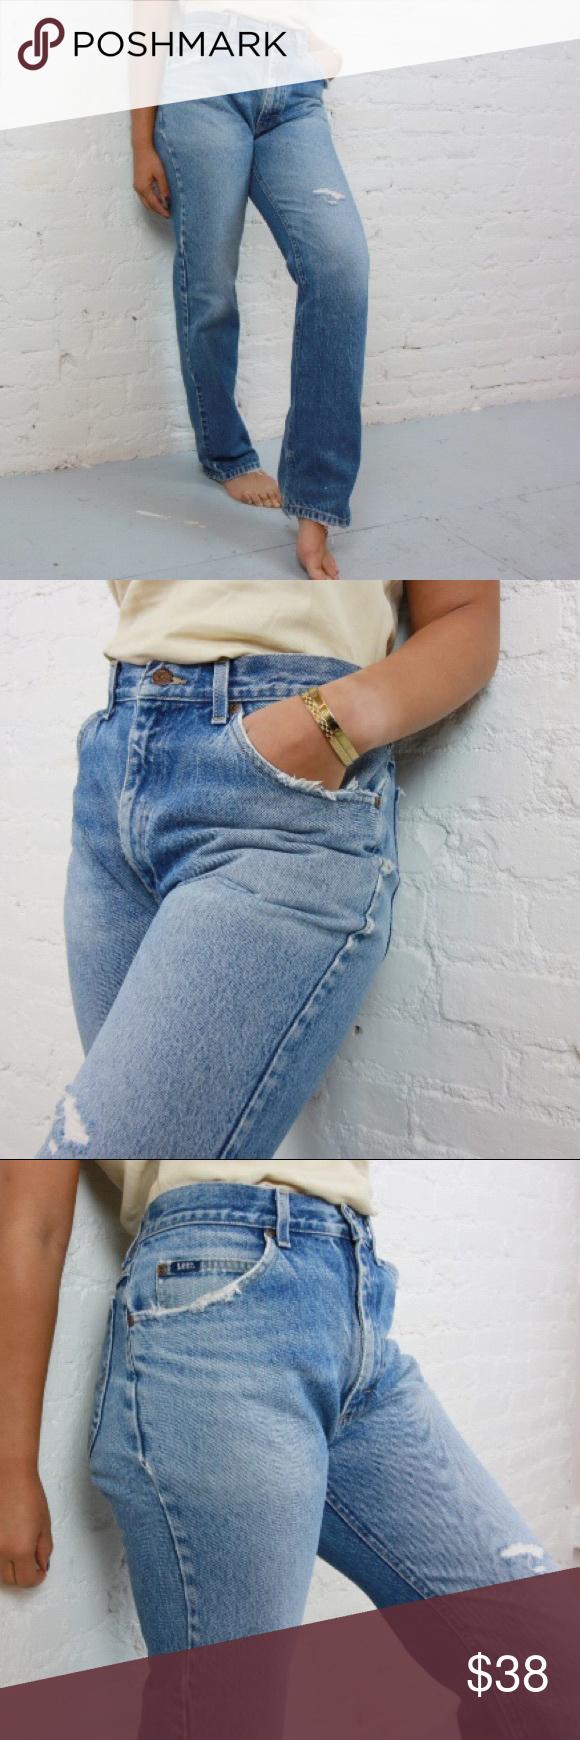 "Lee Distressed Denim Jean Distressed Ripped Jeans Waist 17"" | Hips 19"" | Wai…"